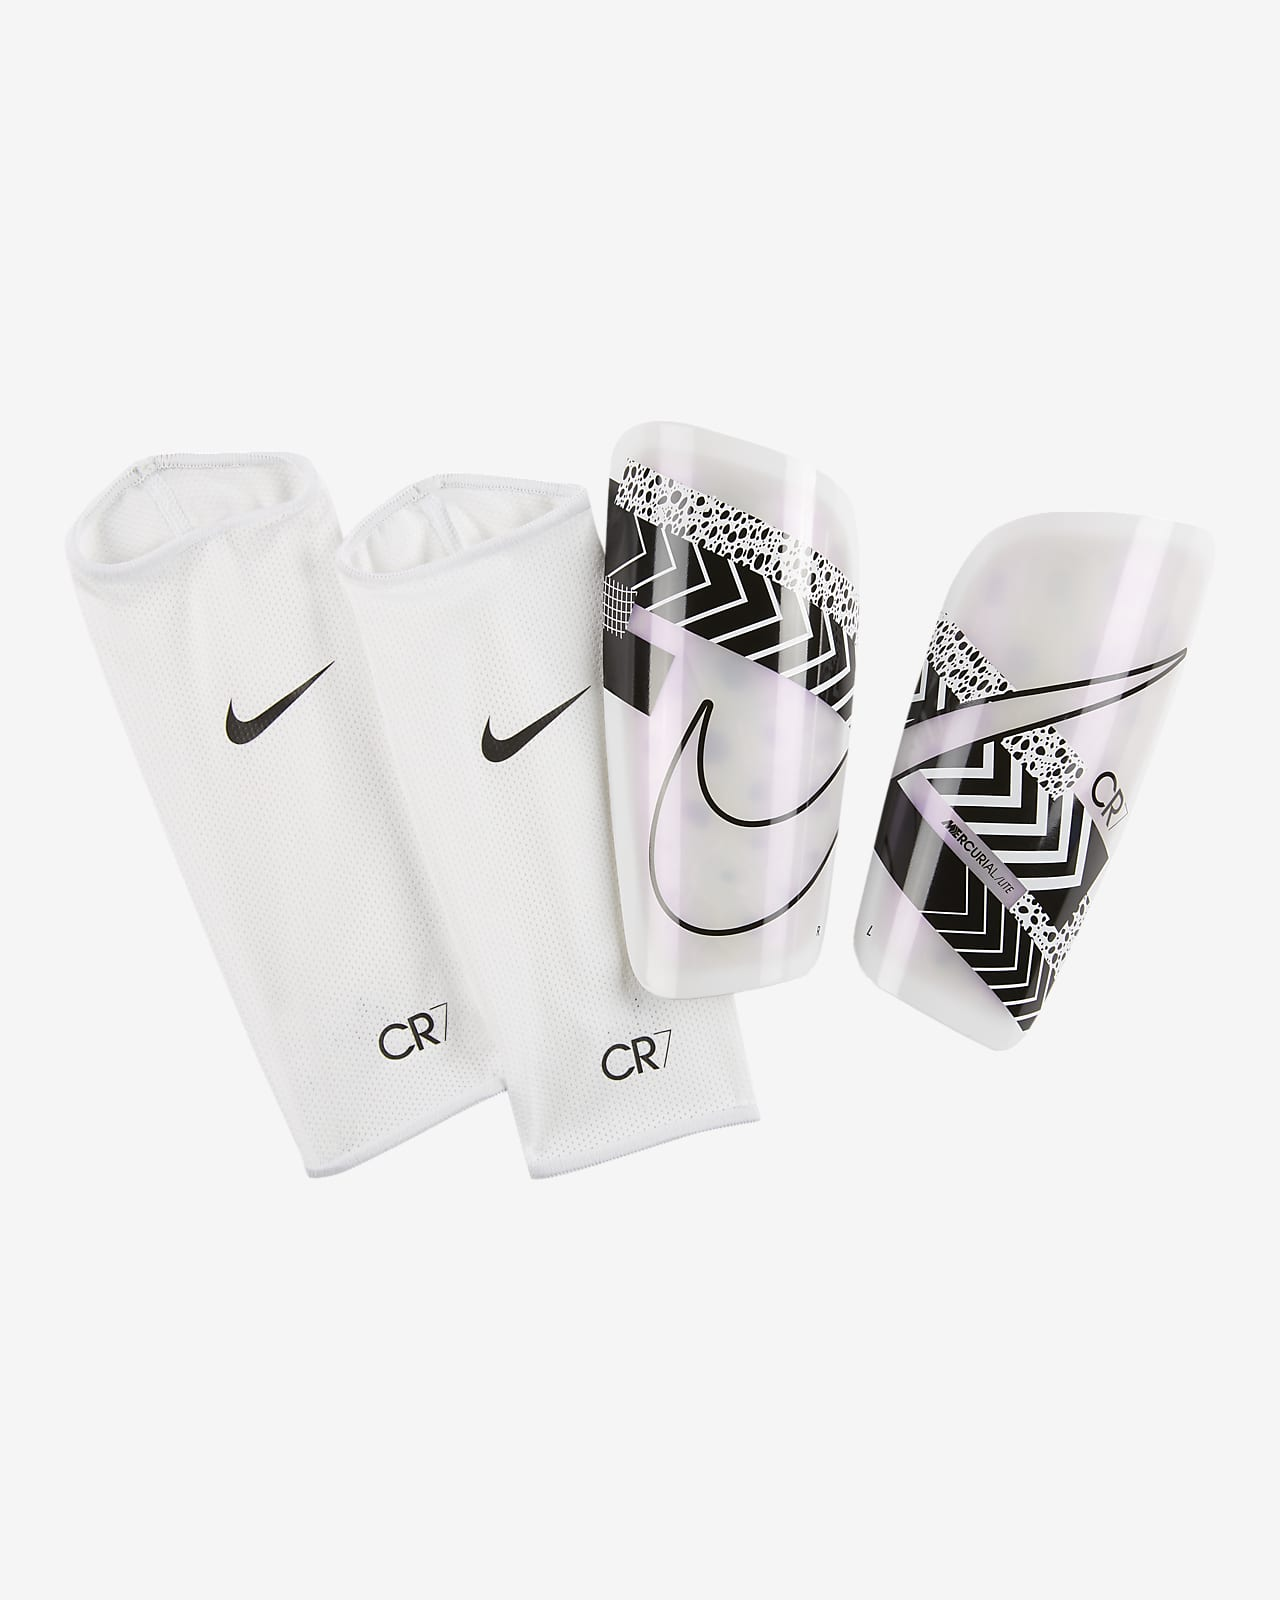 Nike Mercurial Lite CR7 Fußball-Schienbeinschoner